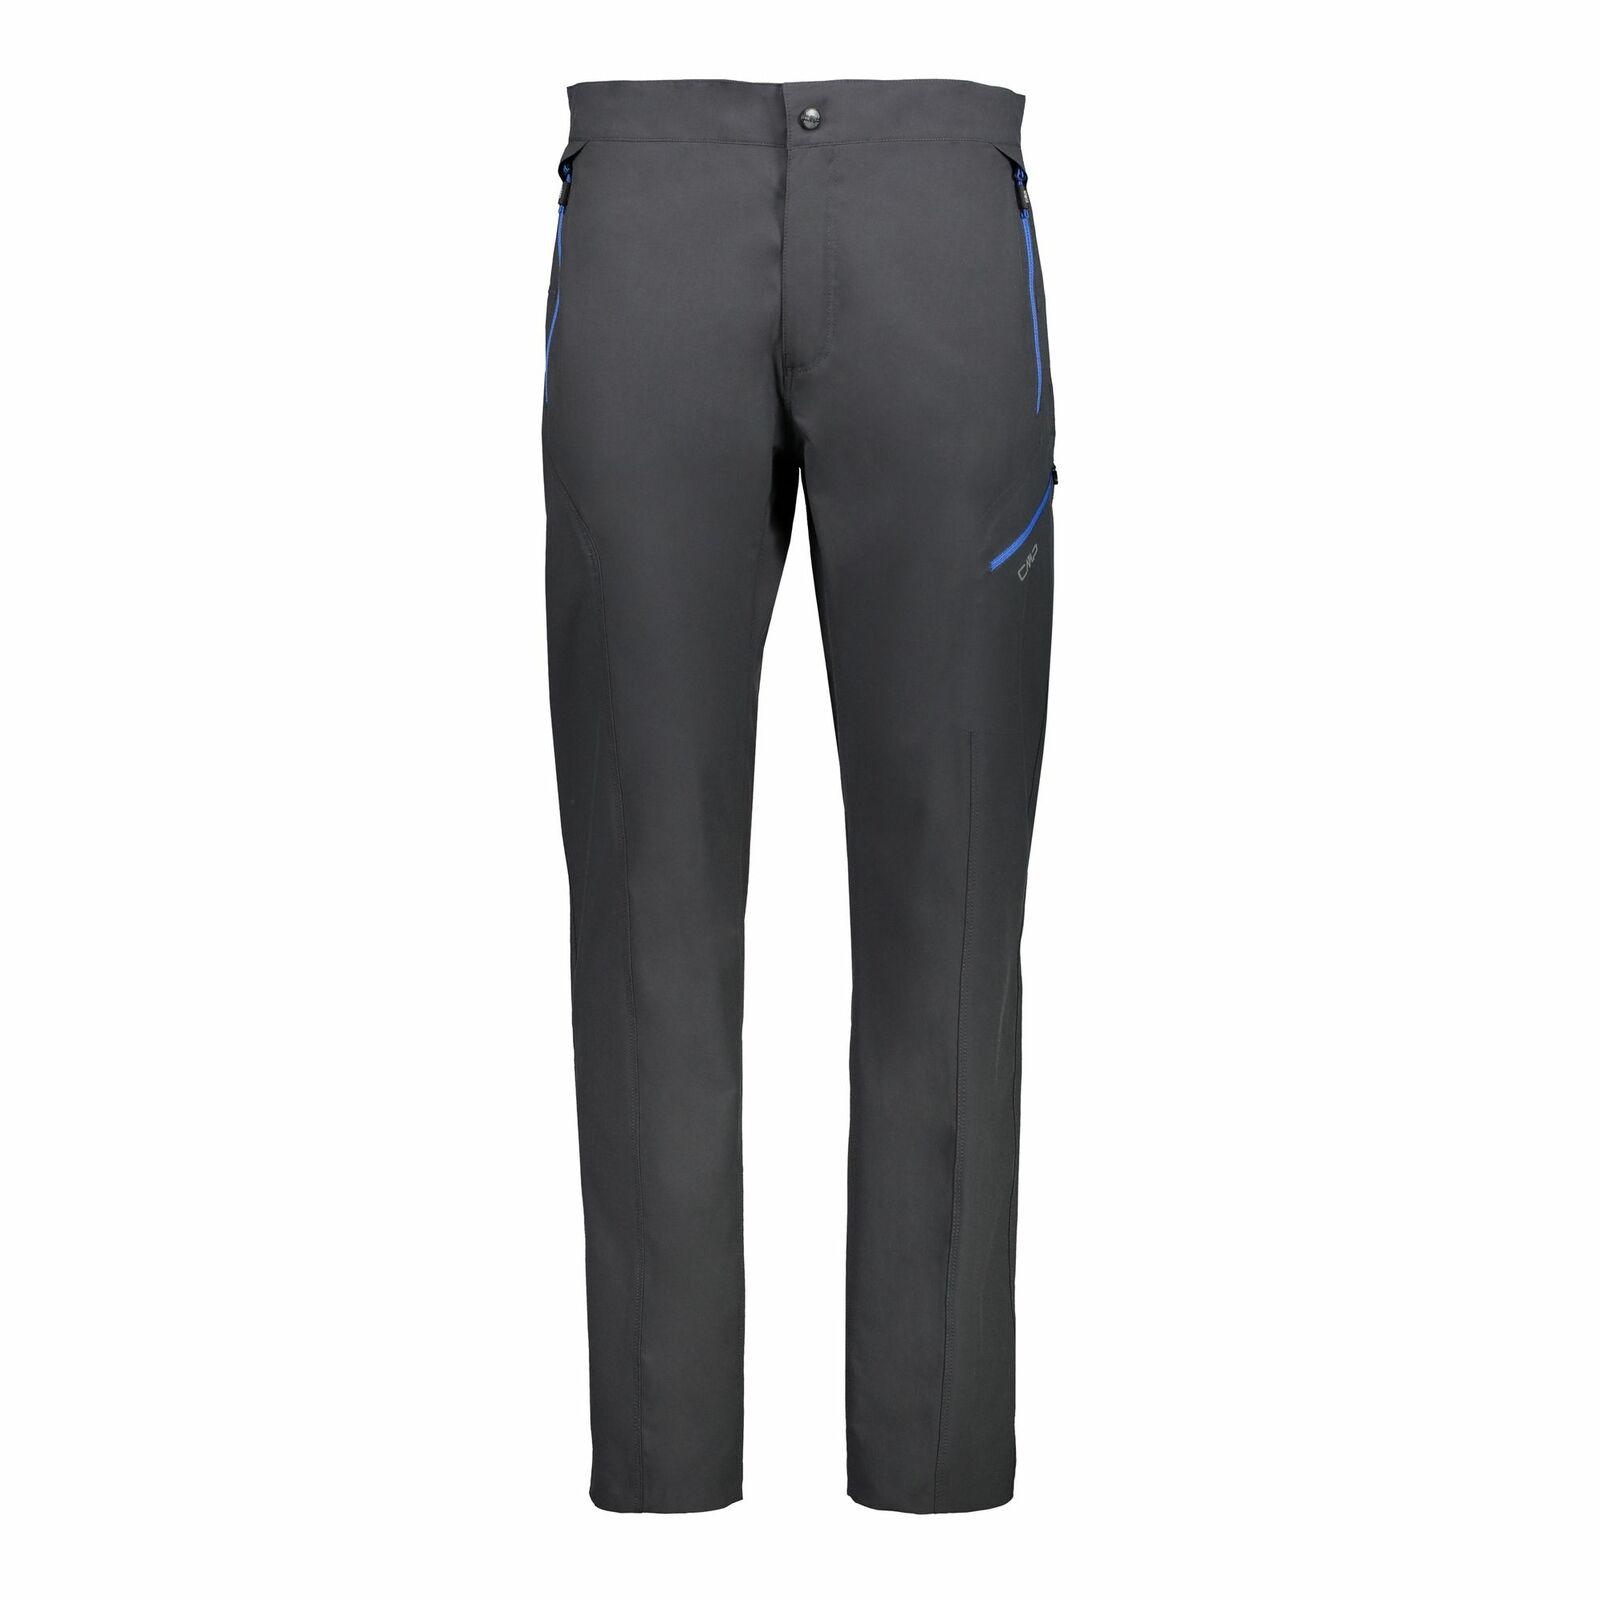 CMP Funktionshose Wanderhosen Man Long Pant grau wasserabweisend atmungsaktiv